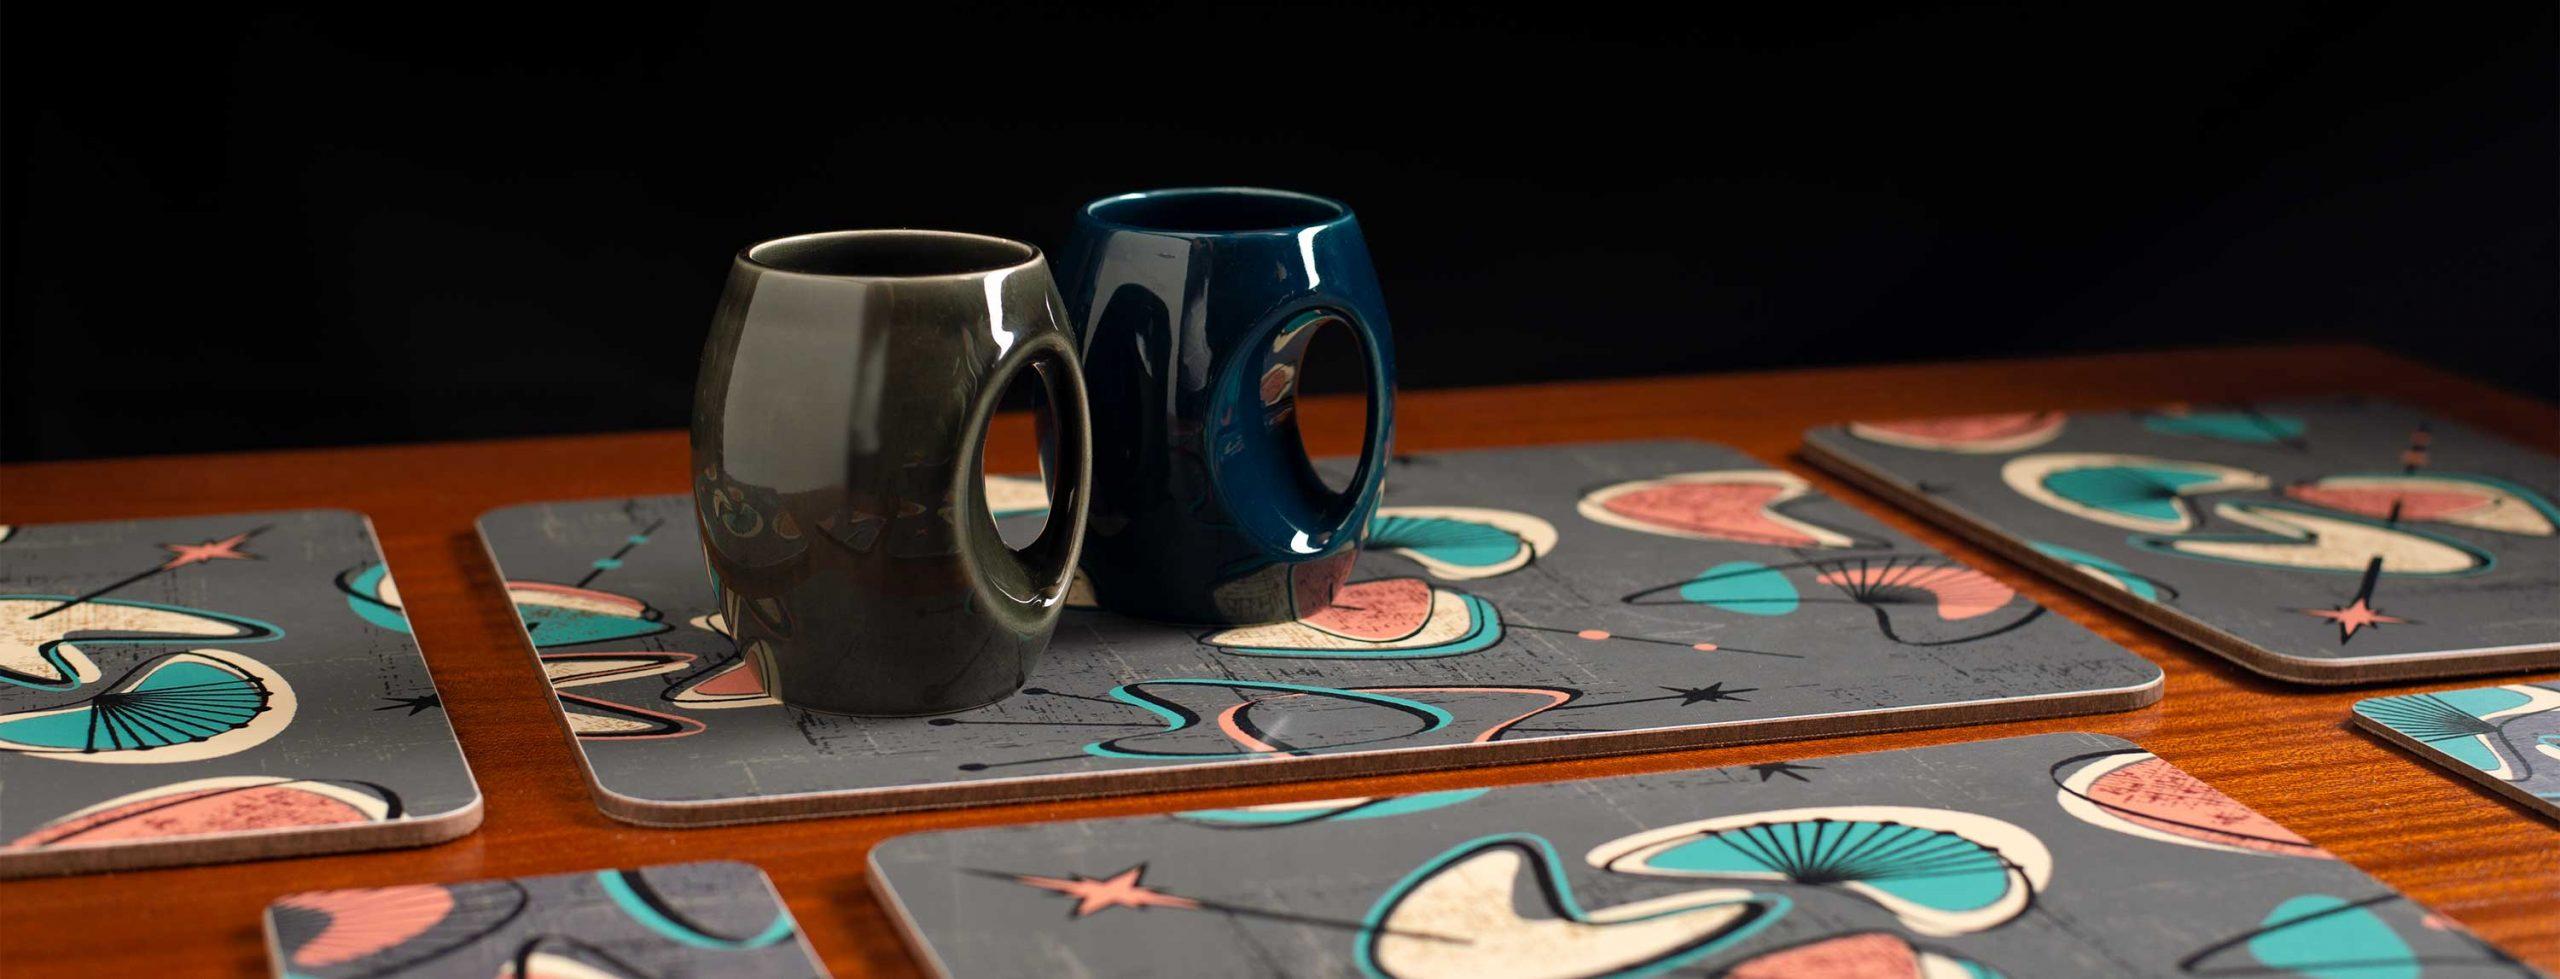 mid century modern tableware